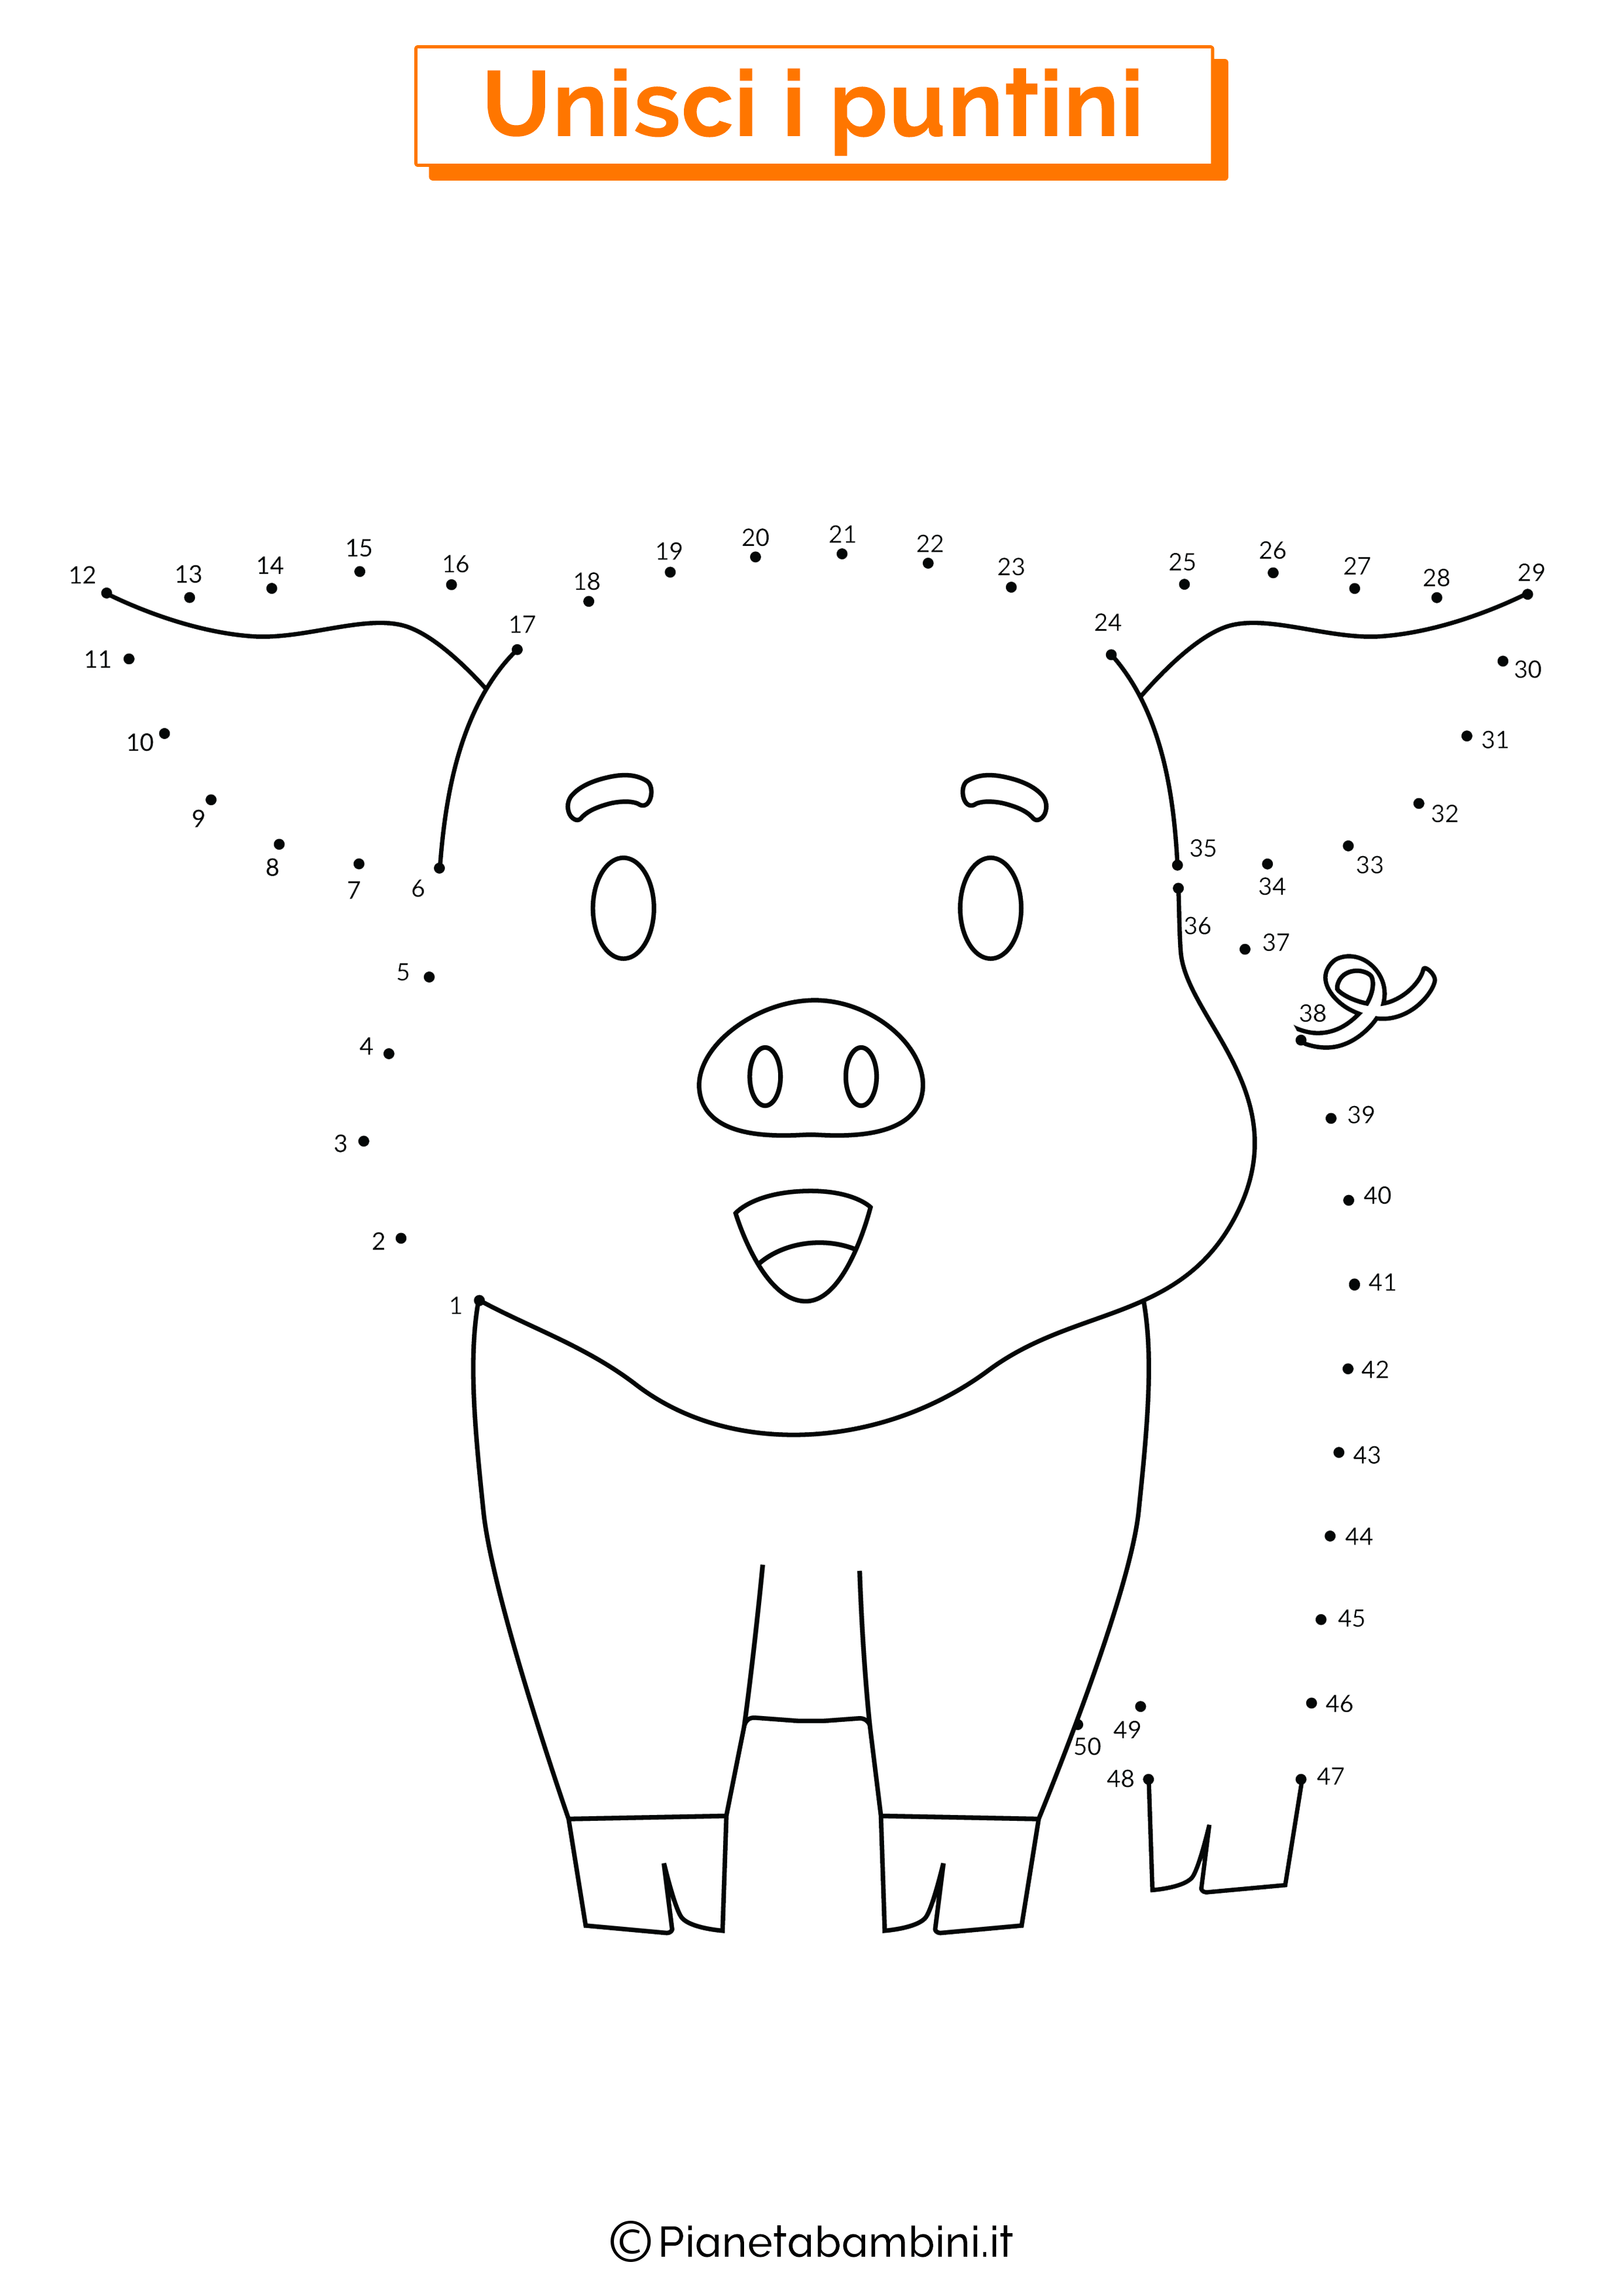 Disegno unisci i puntini da 1 a 50 maiale